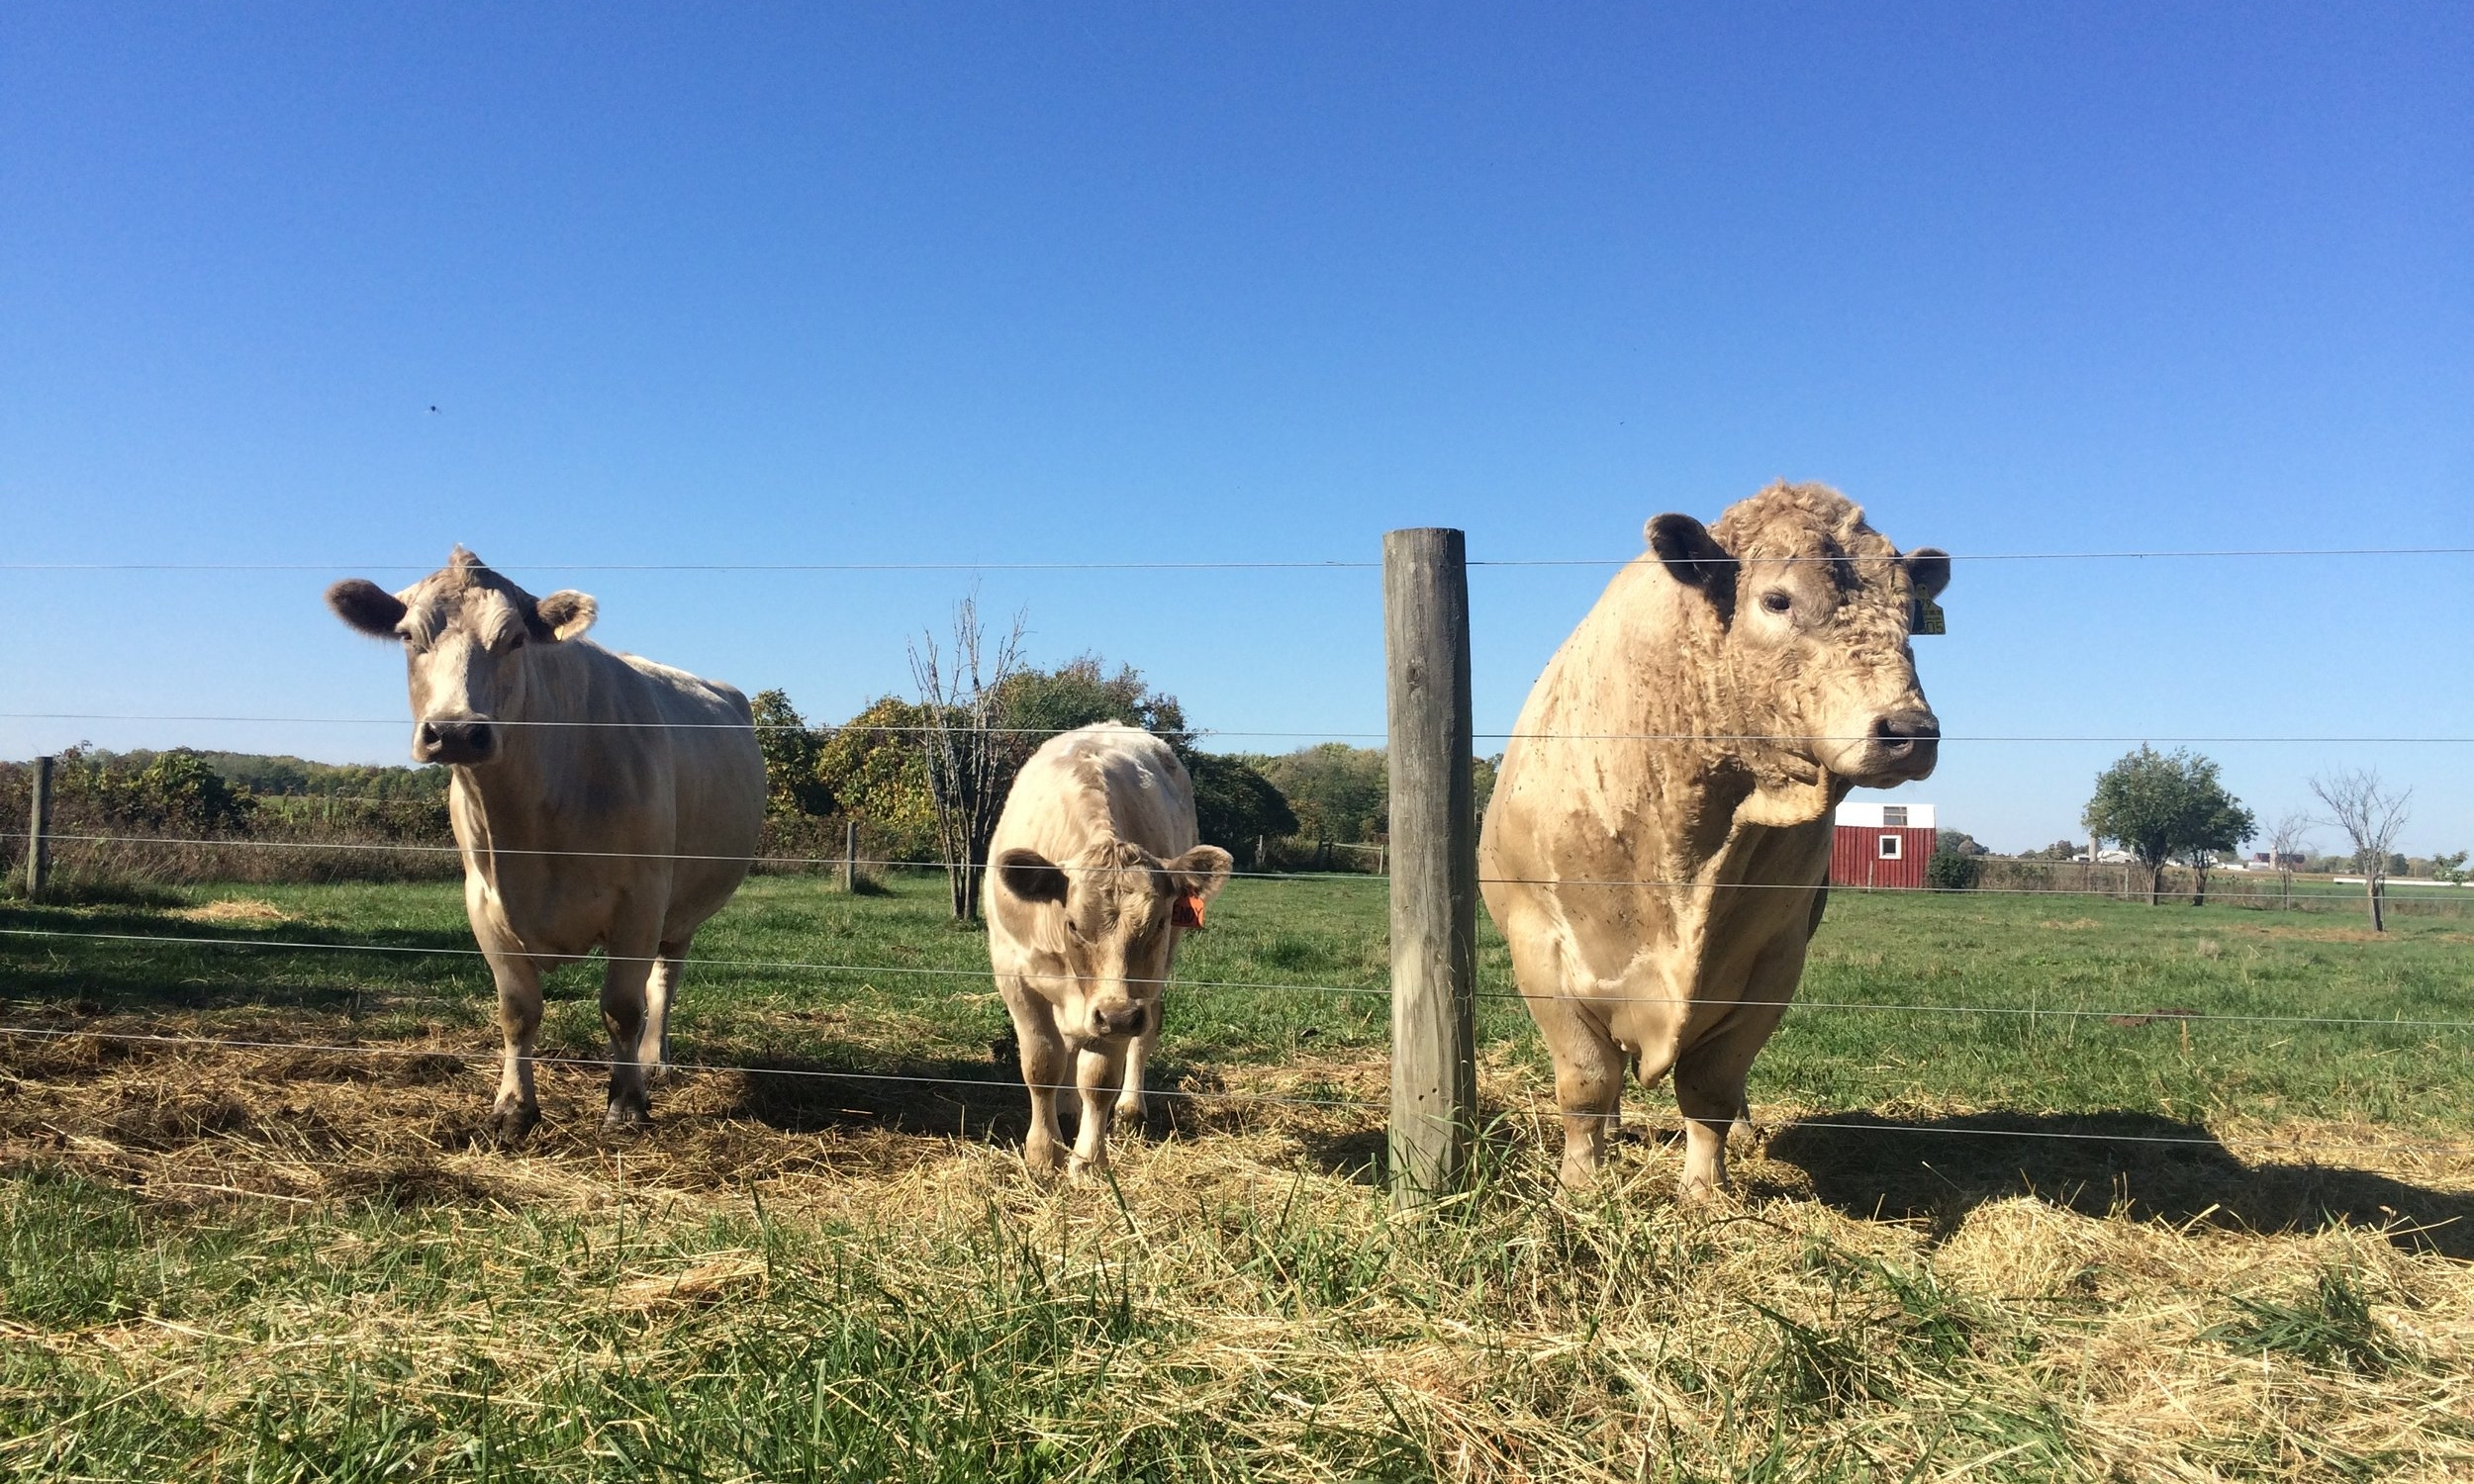 Murray Gray cattle grazing on pasture in upstate New York